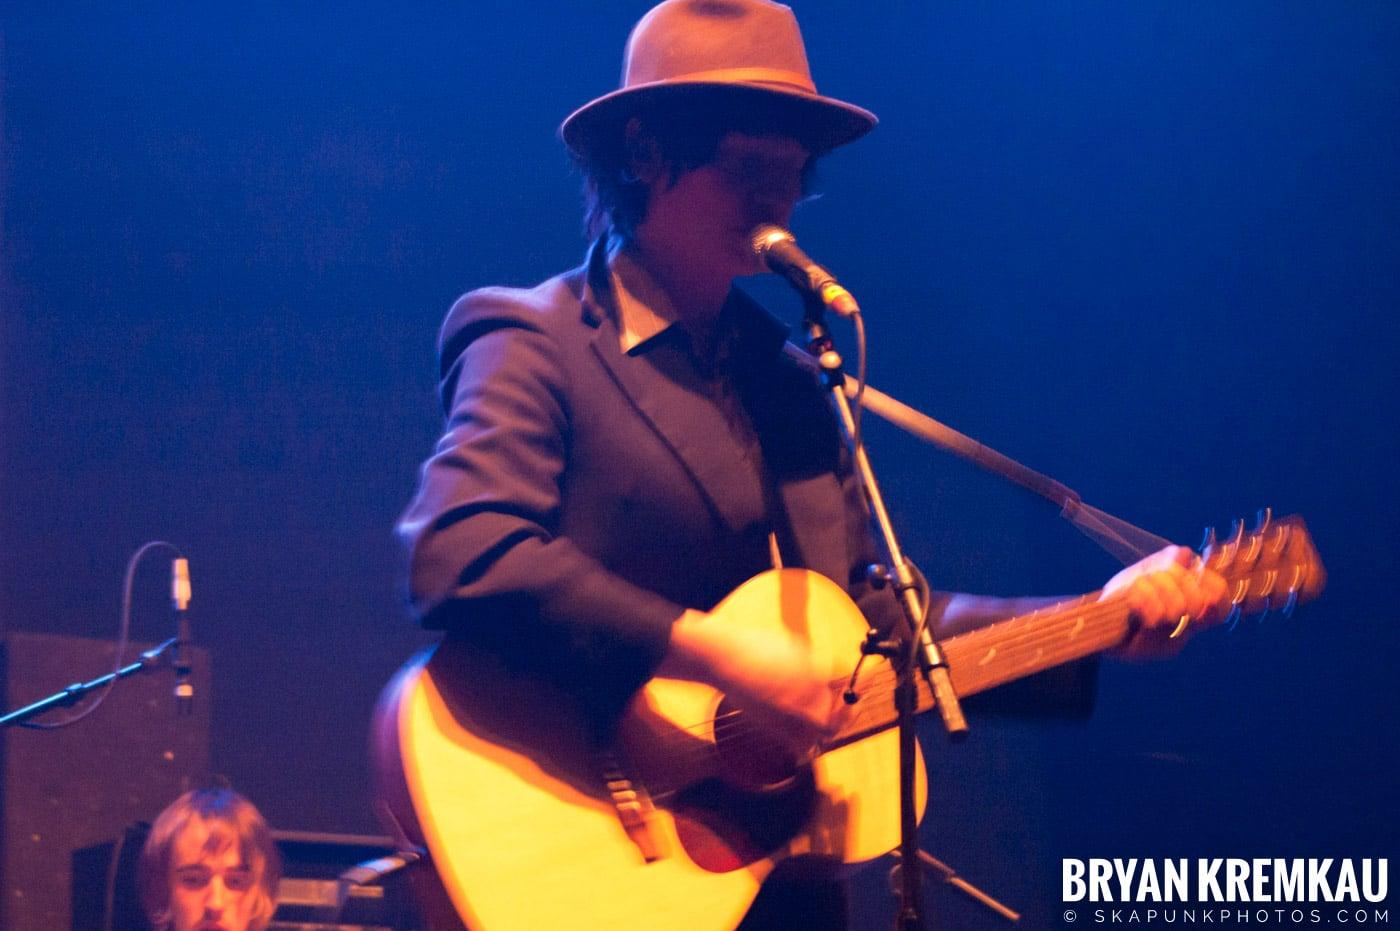 Larrikin Love @ Brixton Academy, London UK - 12.17.06 (3)